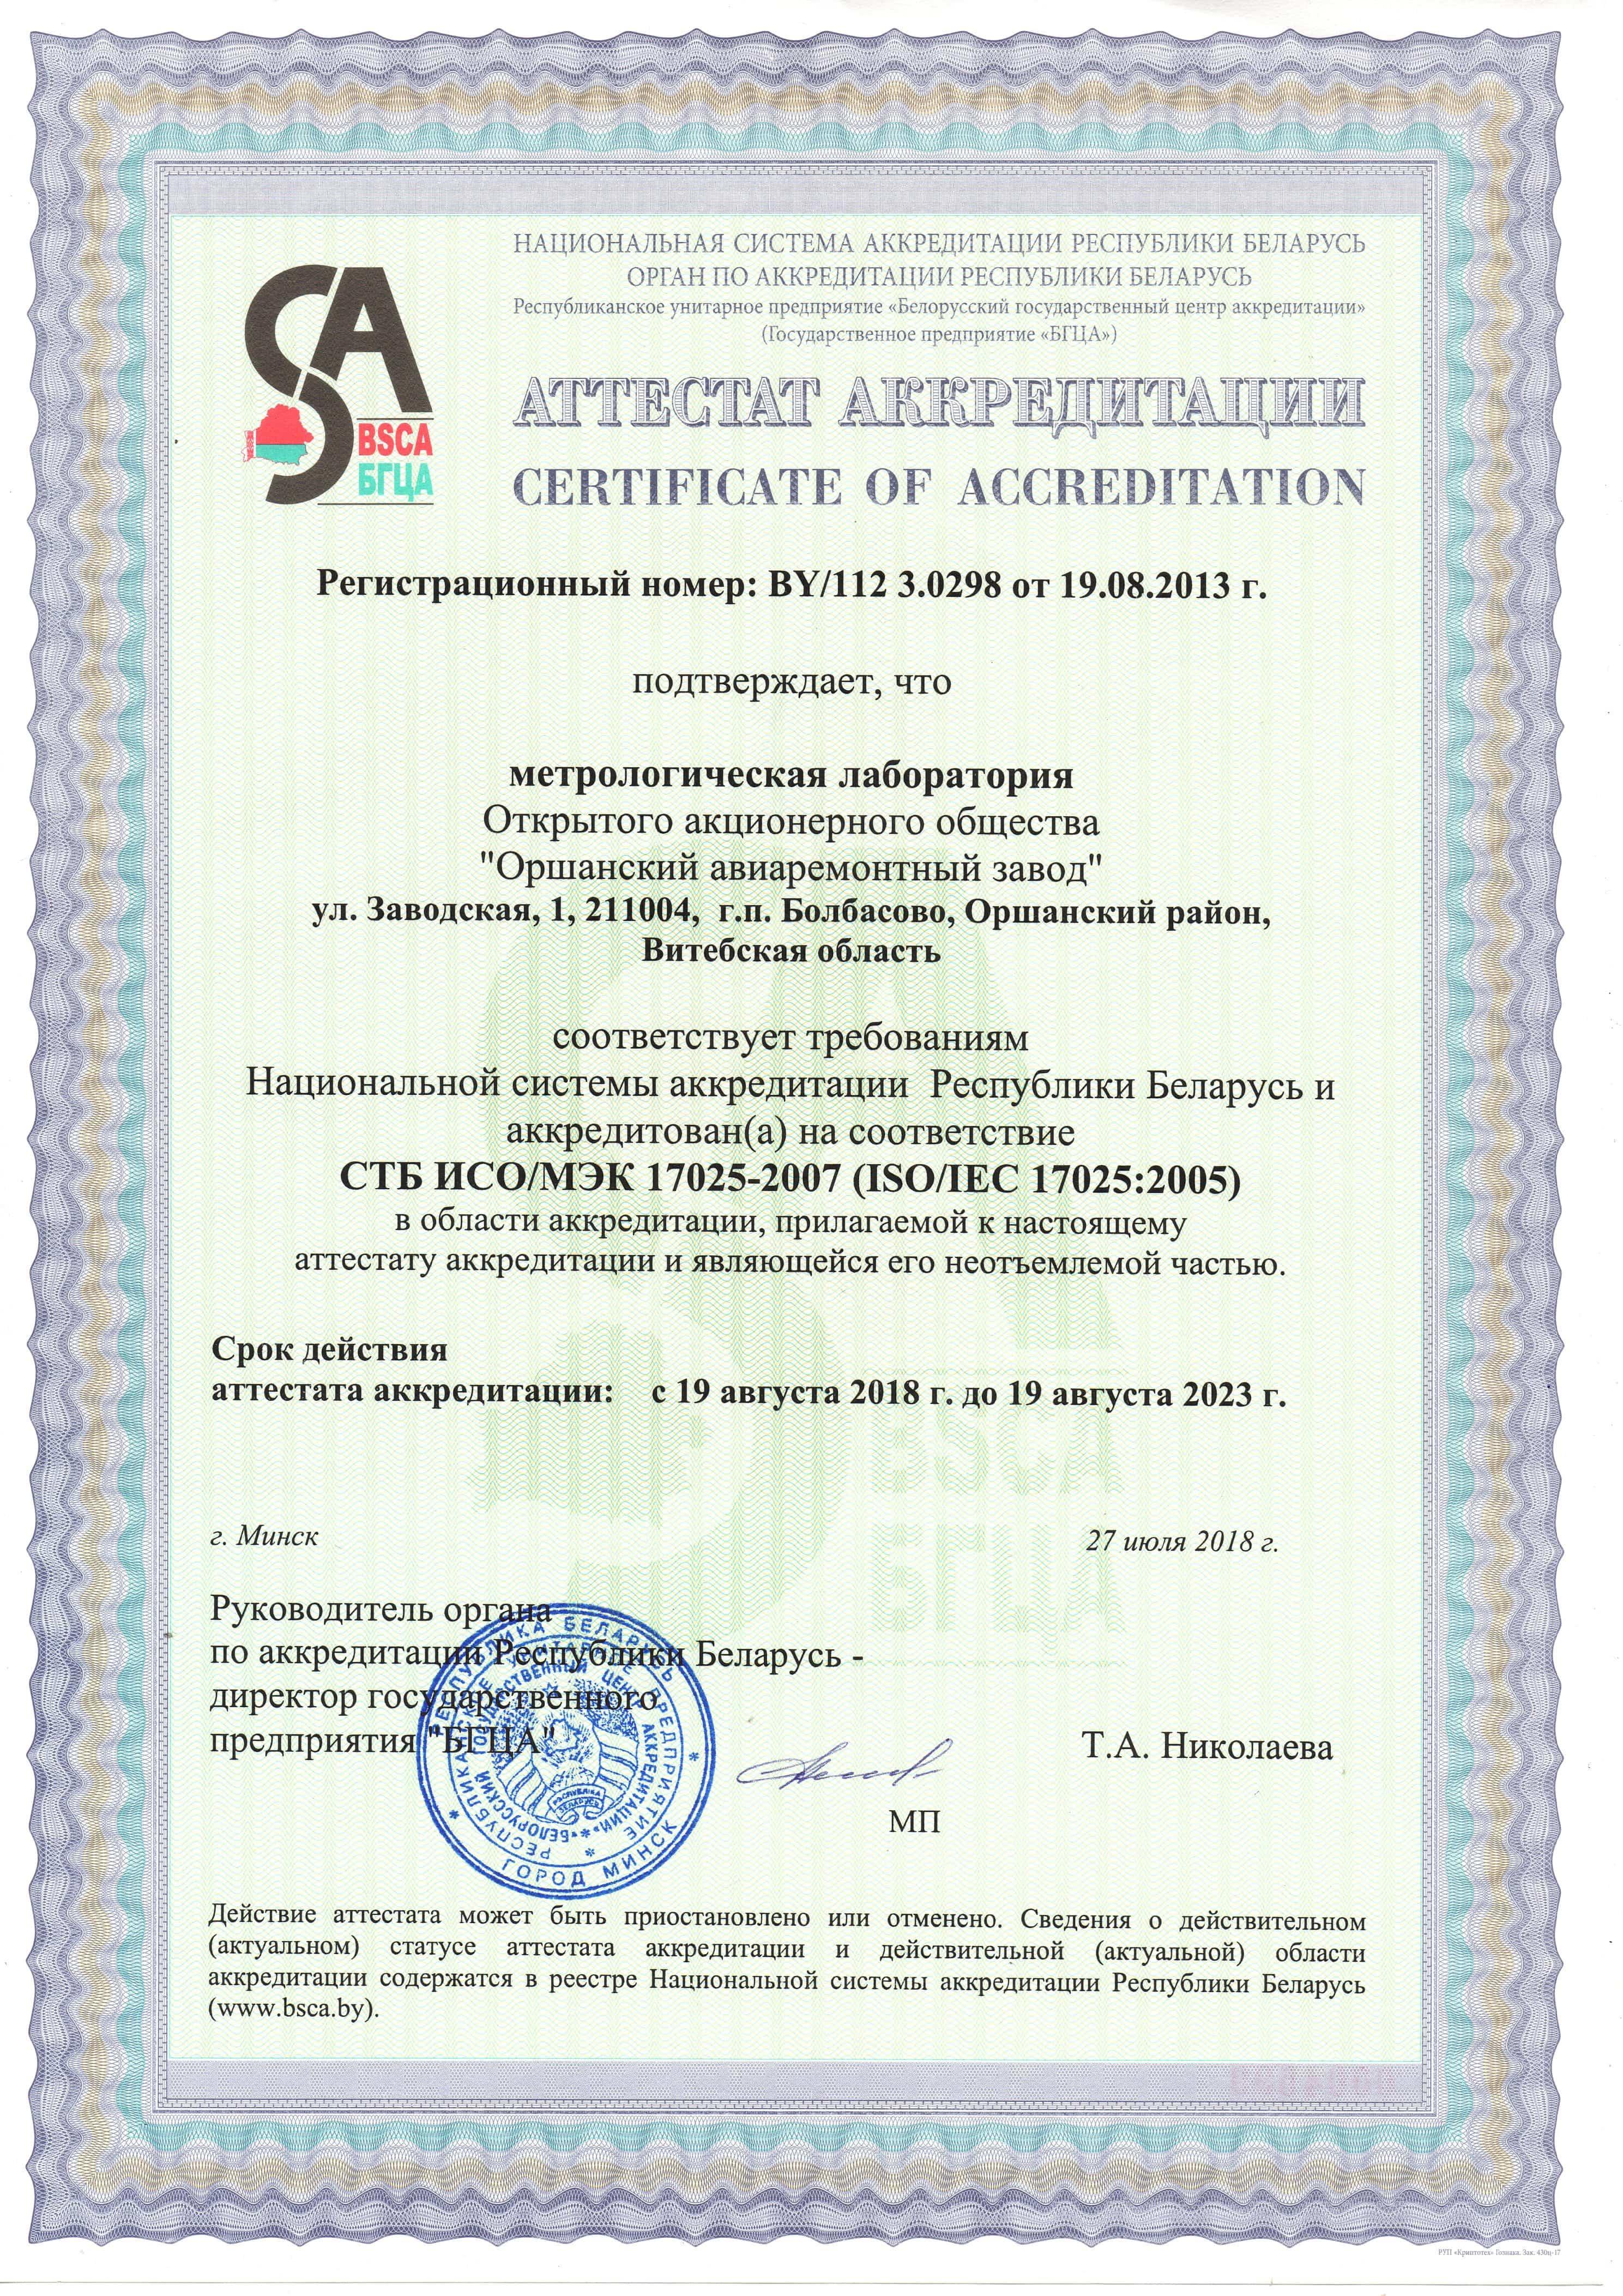 Аттестат аккредитации метрологической лаборатории